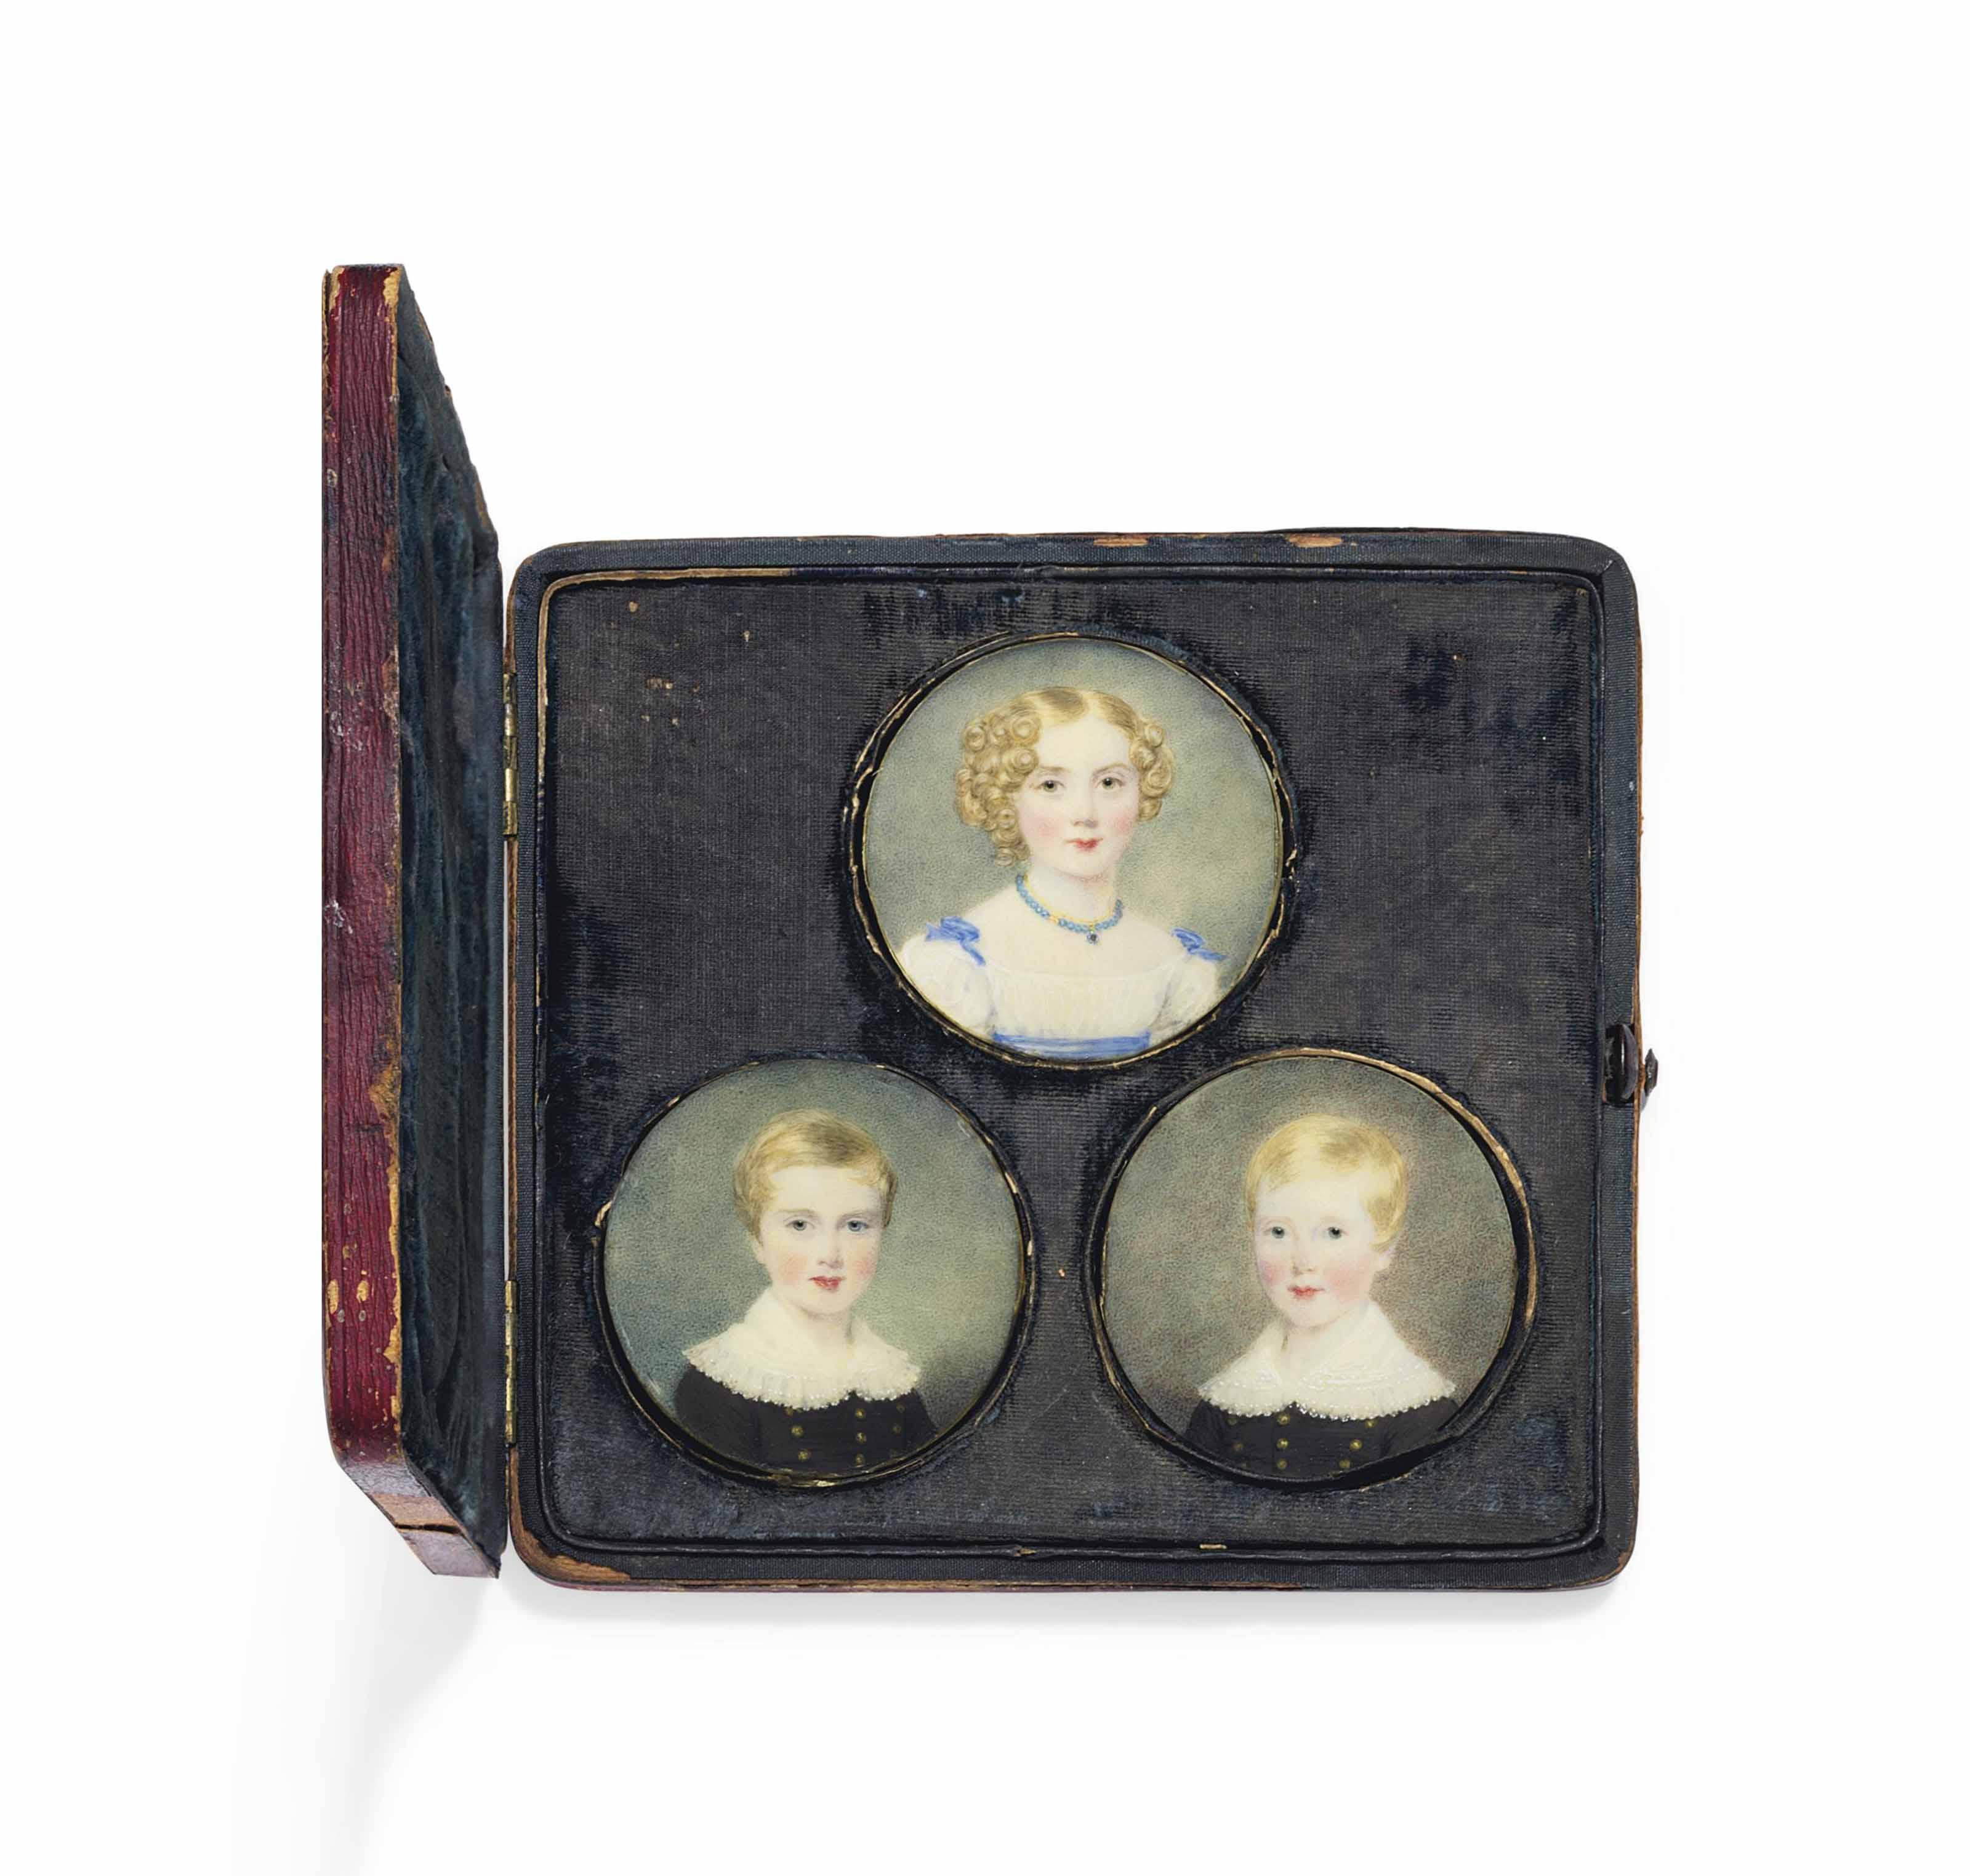 ANTHONY STEWART (BRITISH, 1773-1846)